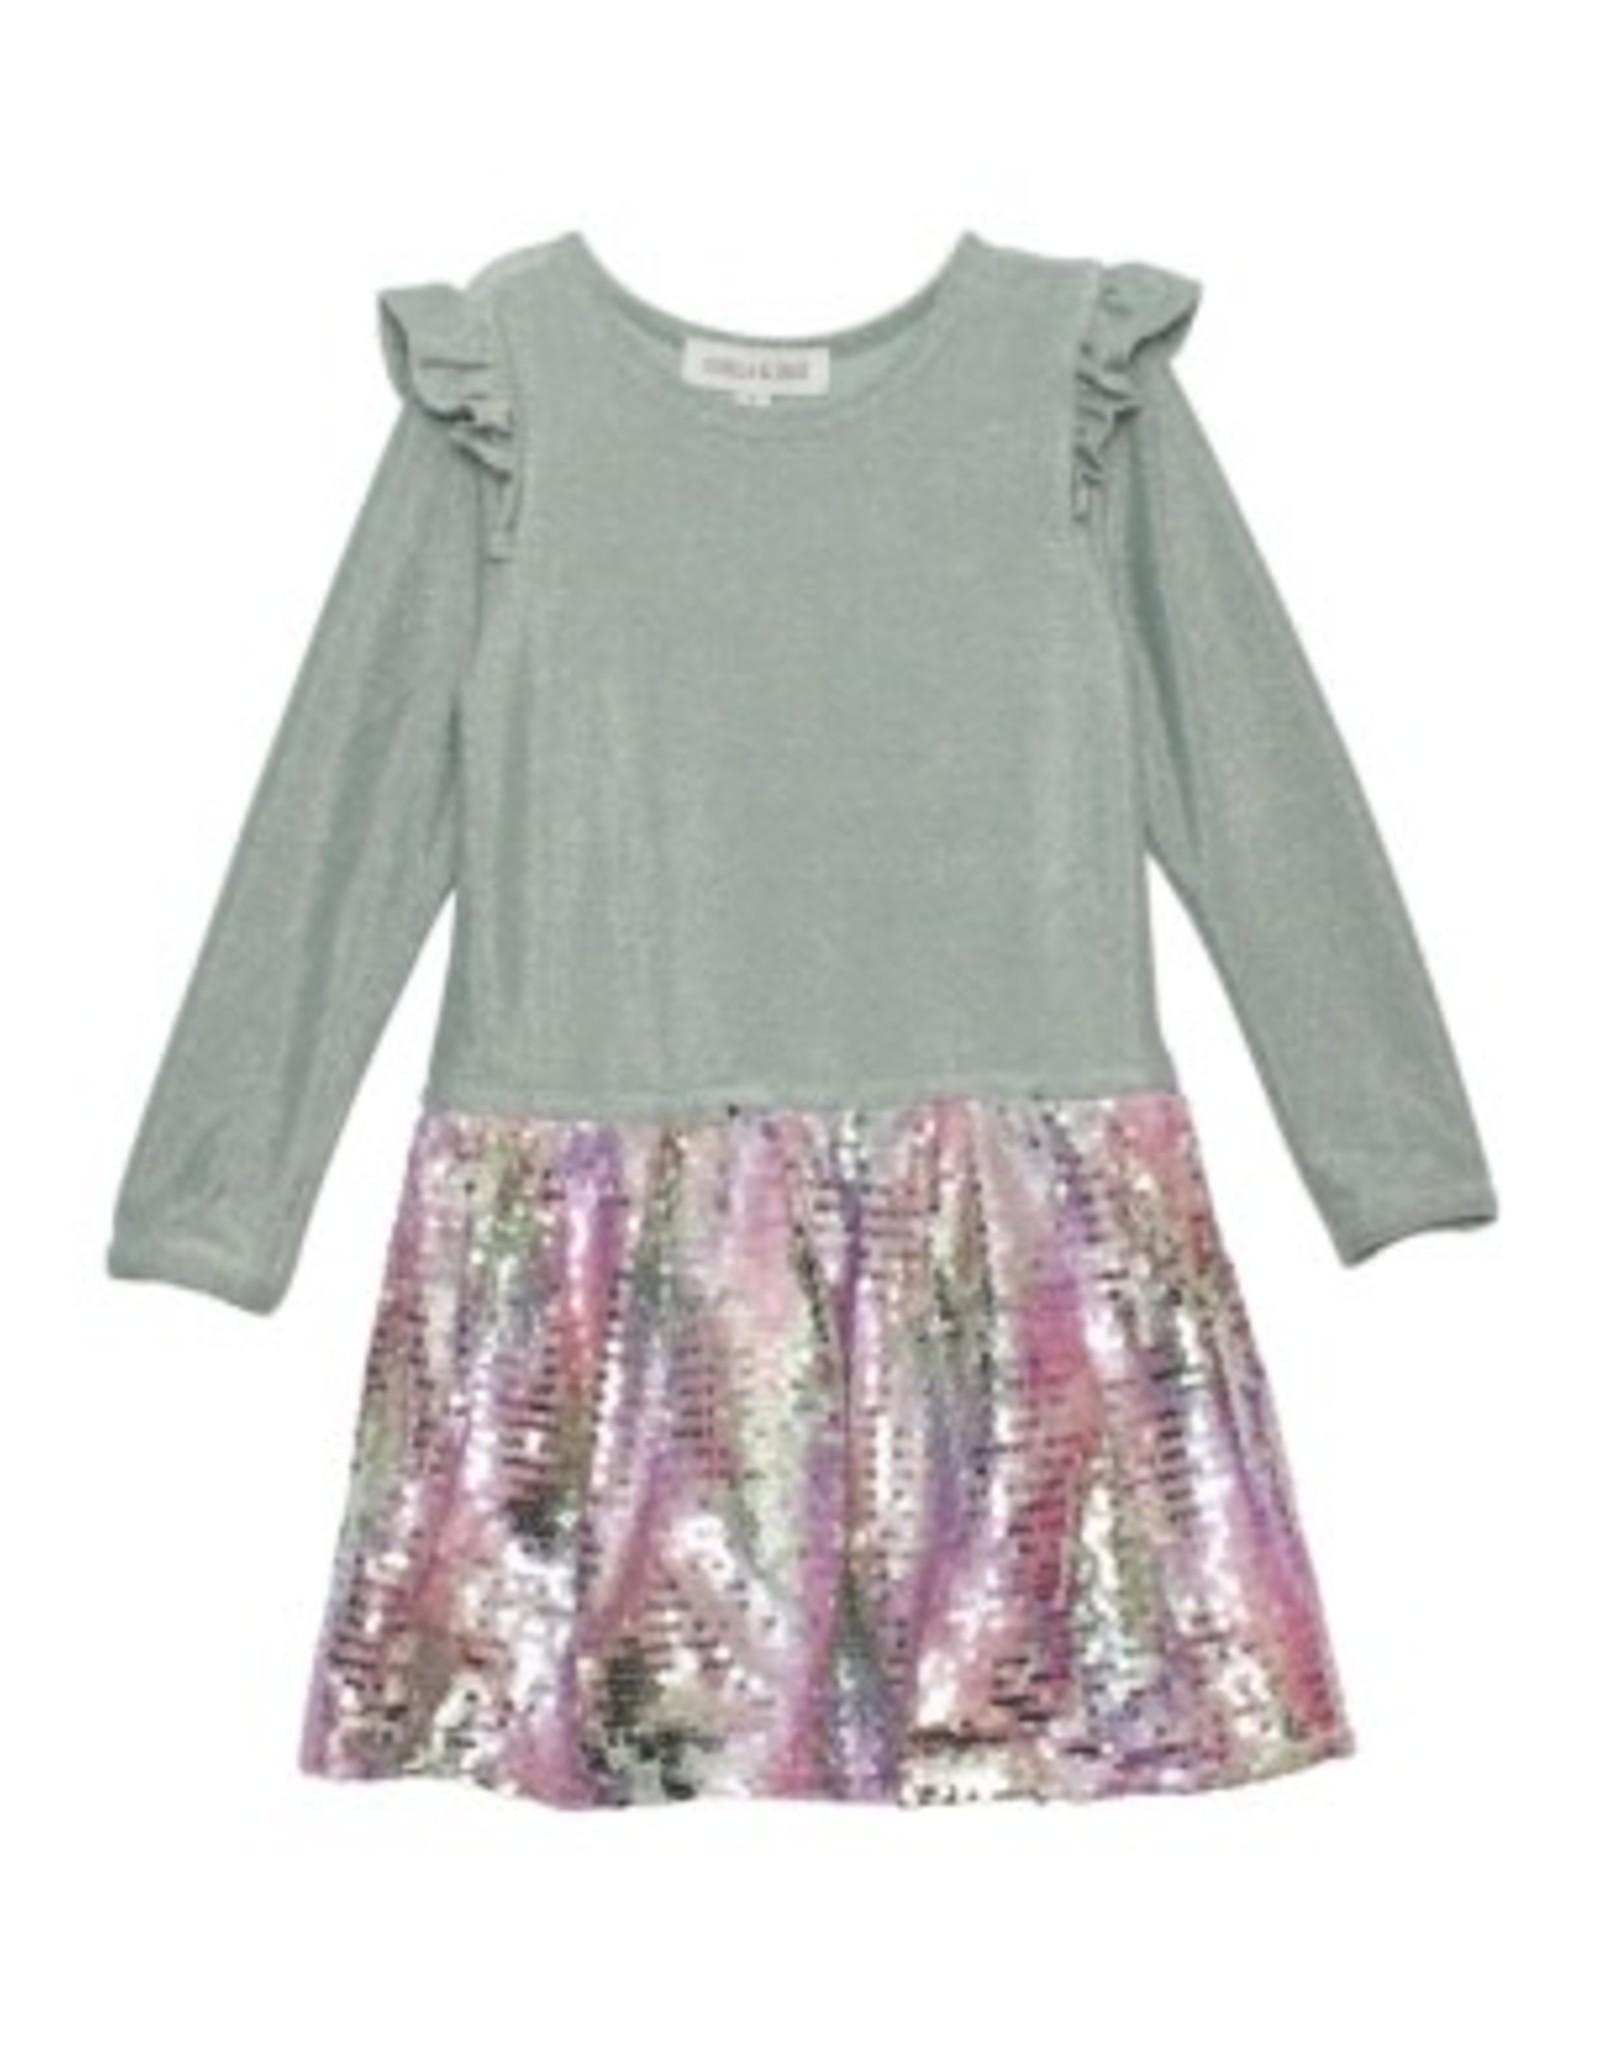 Isobella & Chloe Isobella & Chloe- Glitterbox Knit Dress: Green